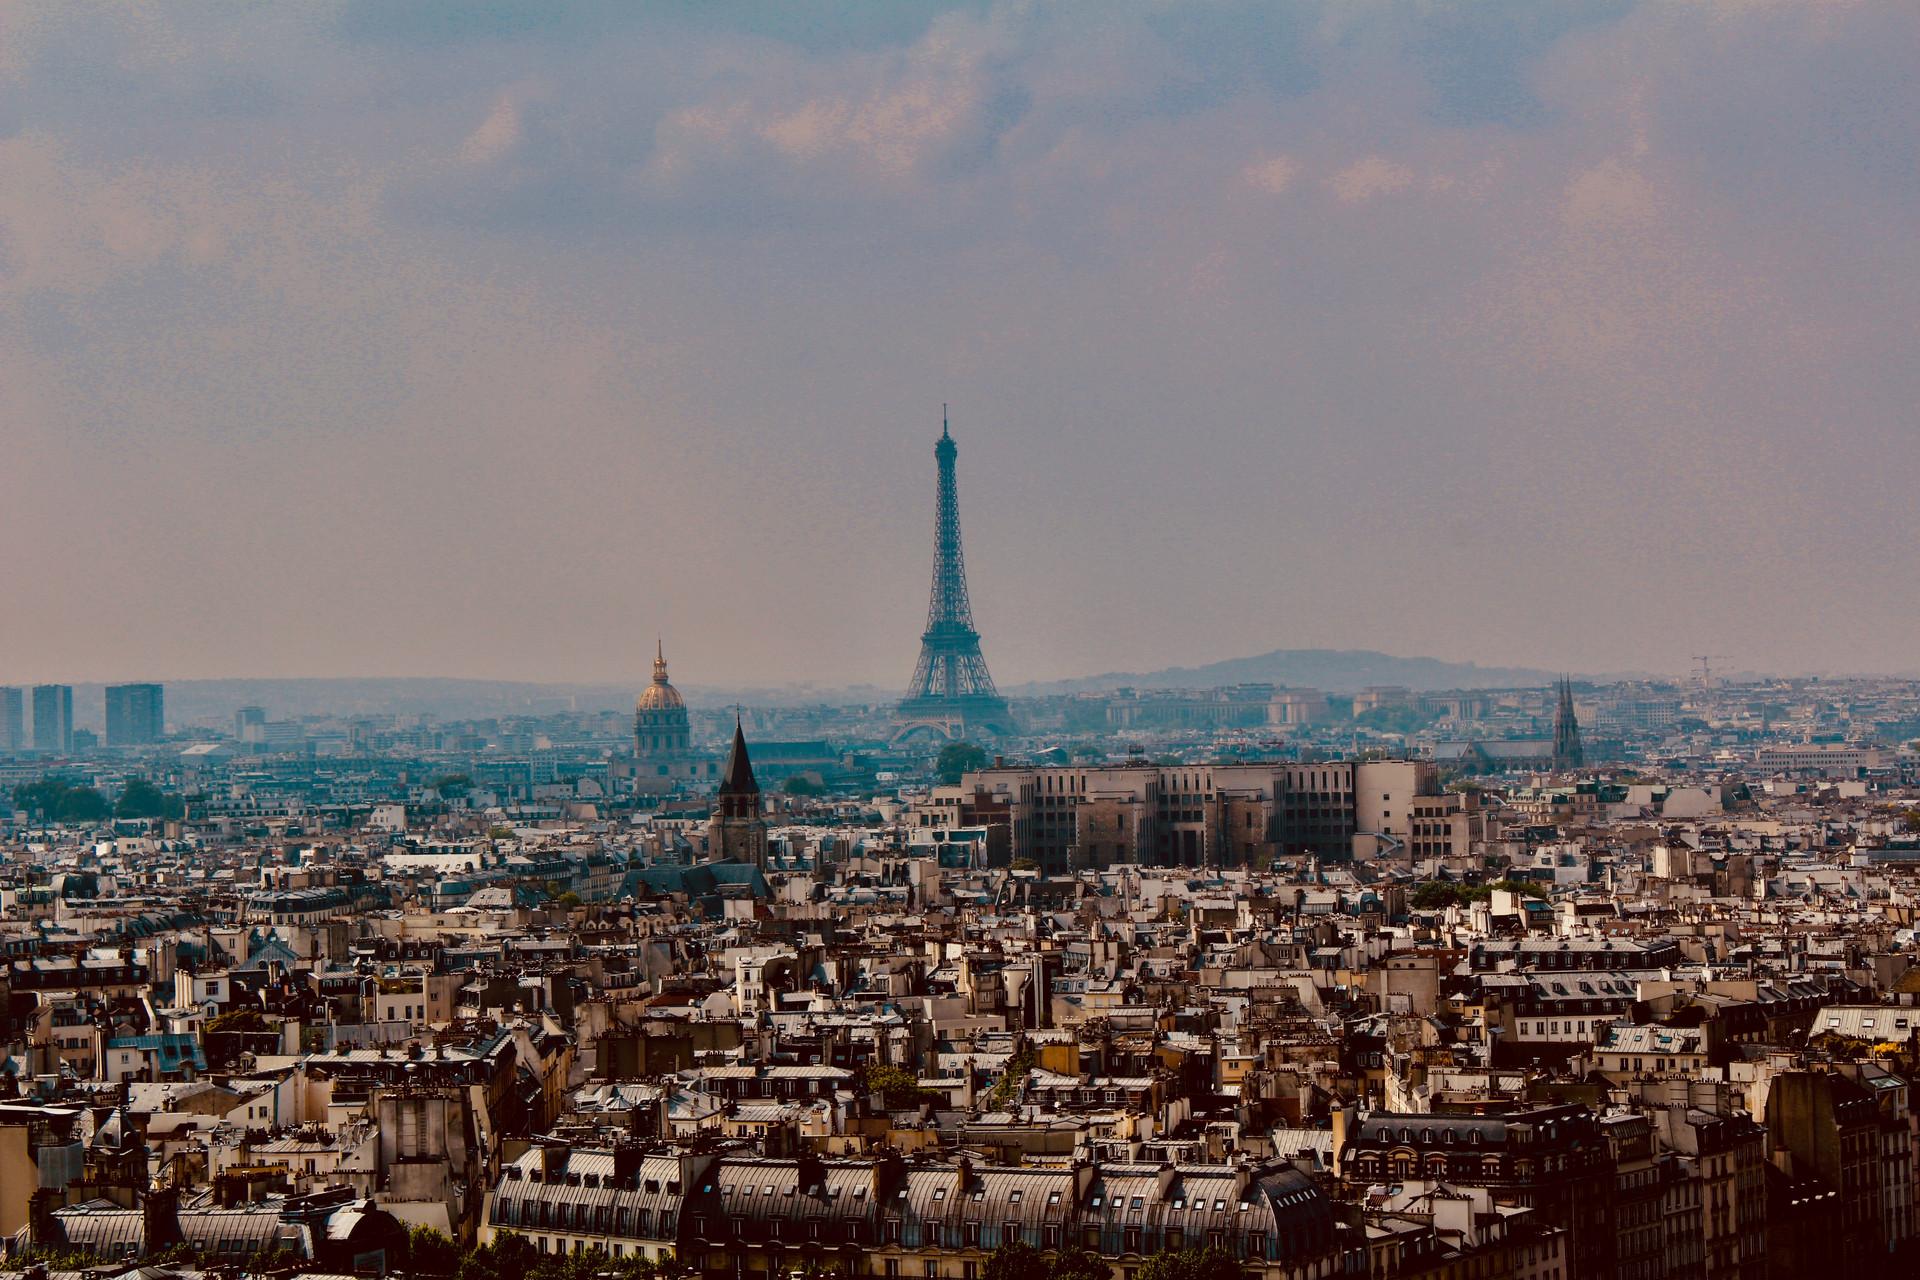 architecture-buildings-city-1308940.jpg